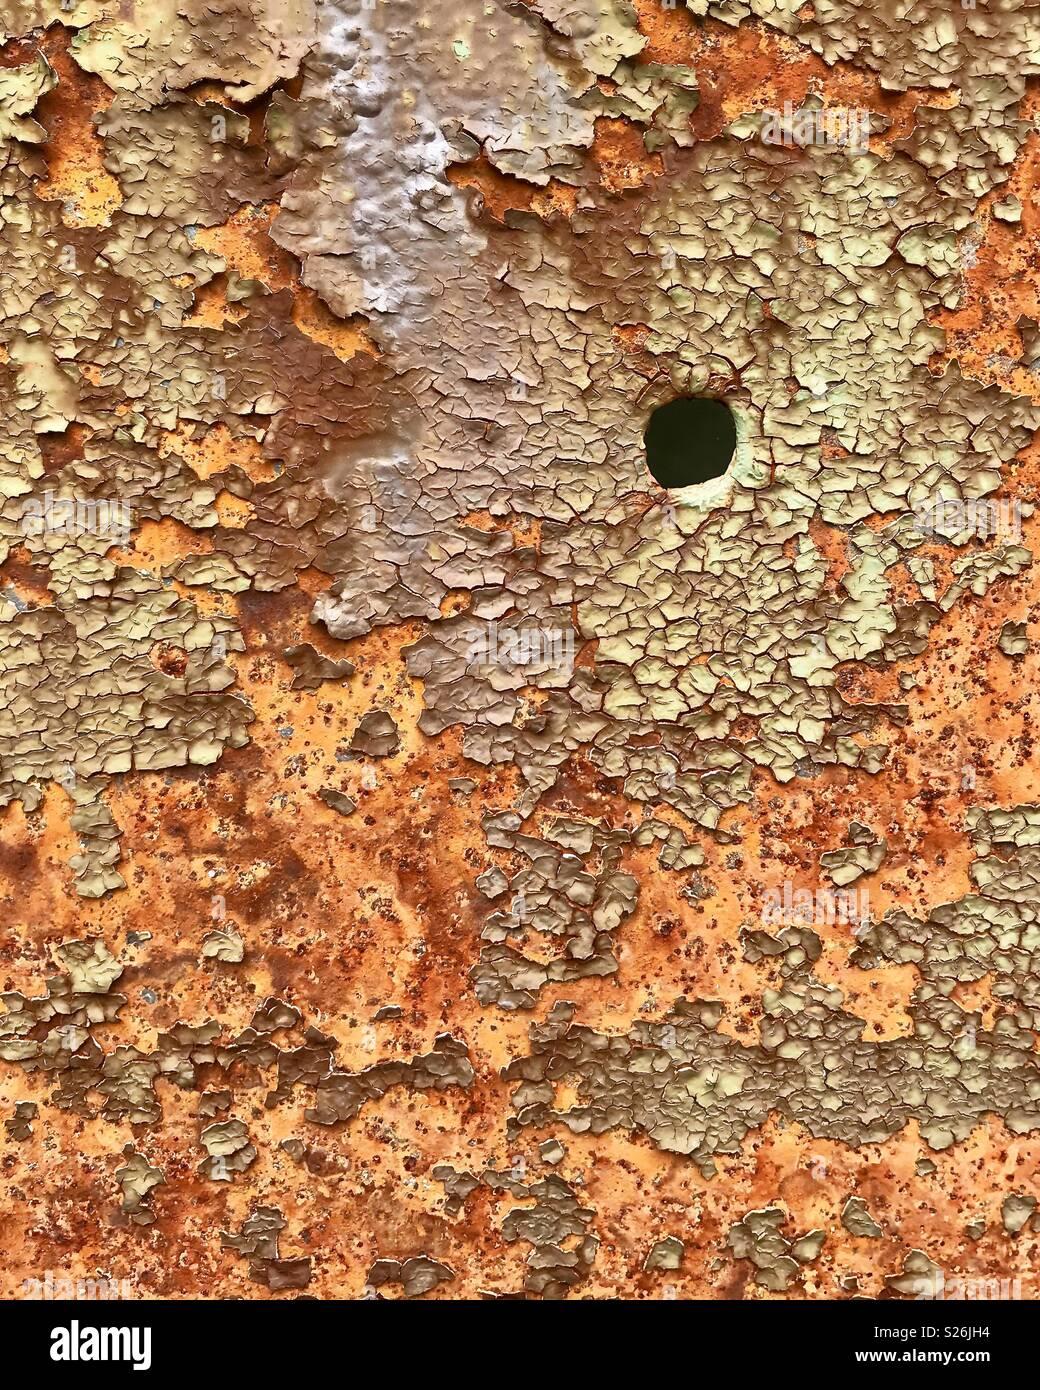 Bullet hole in steel beam - Stock Image